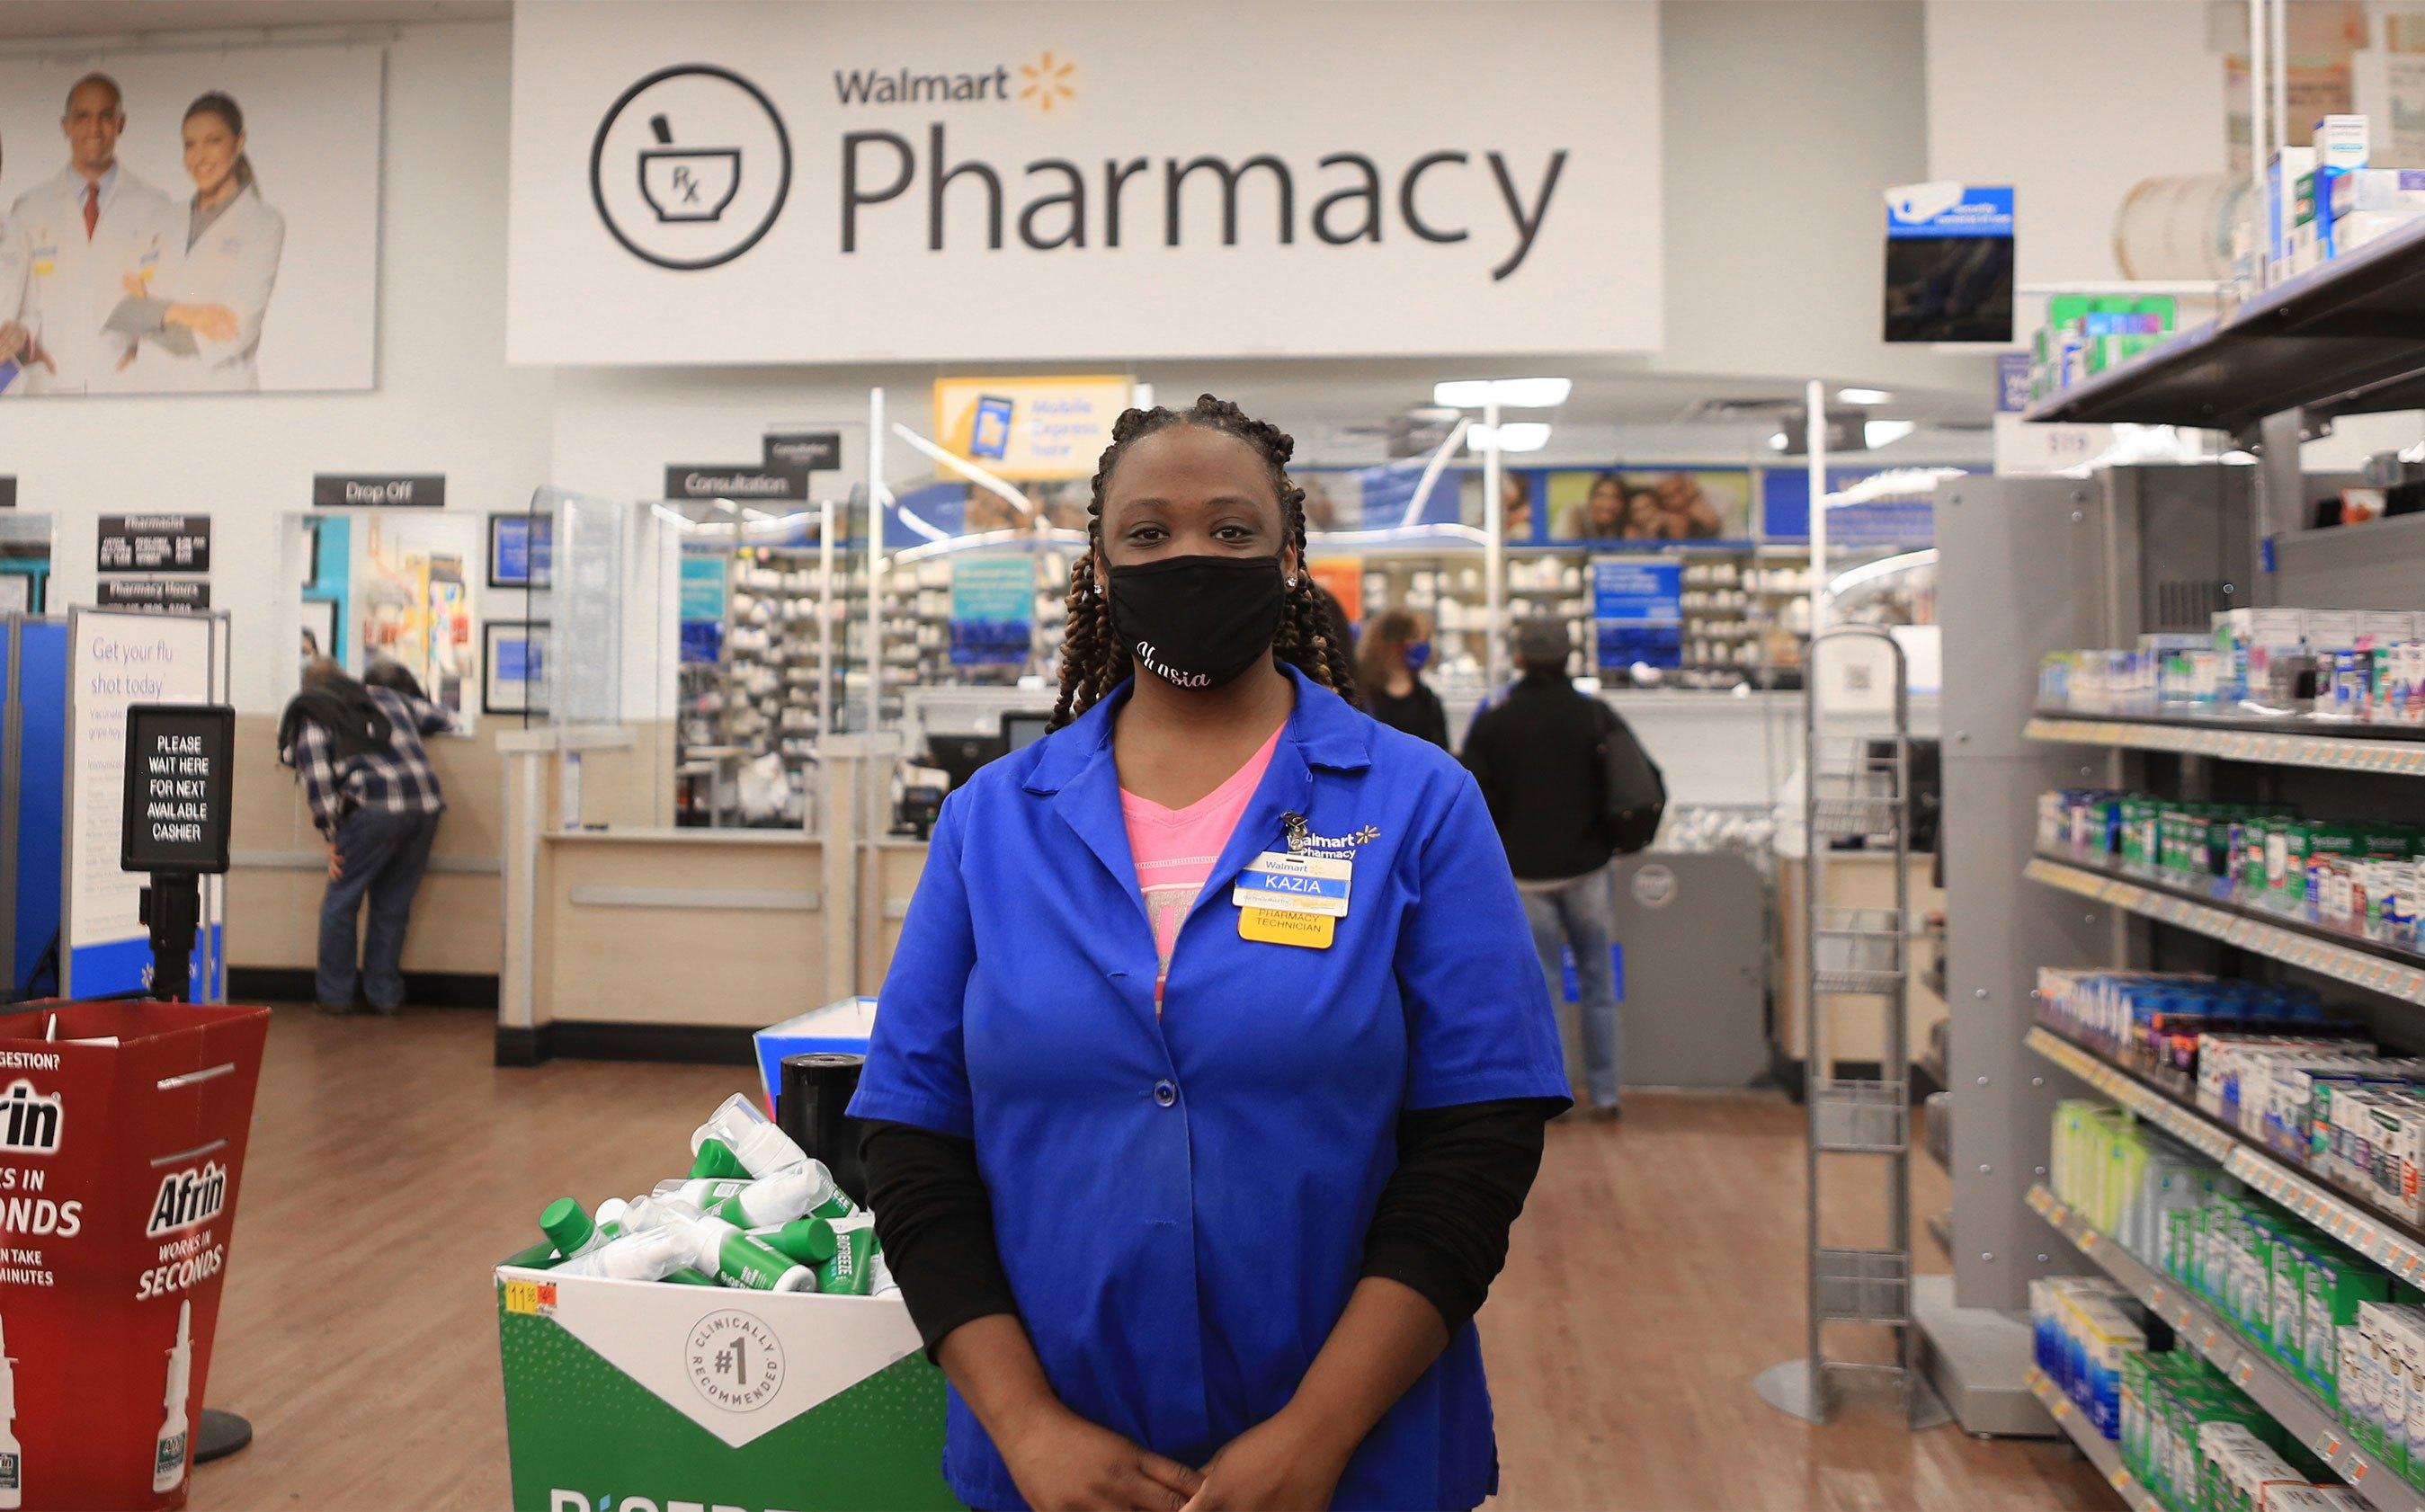 Associate Posing in Front of Pharmacy